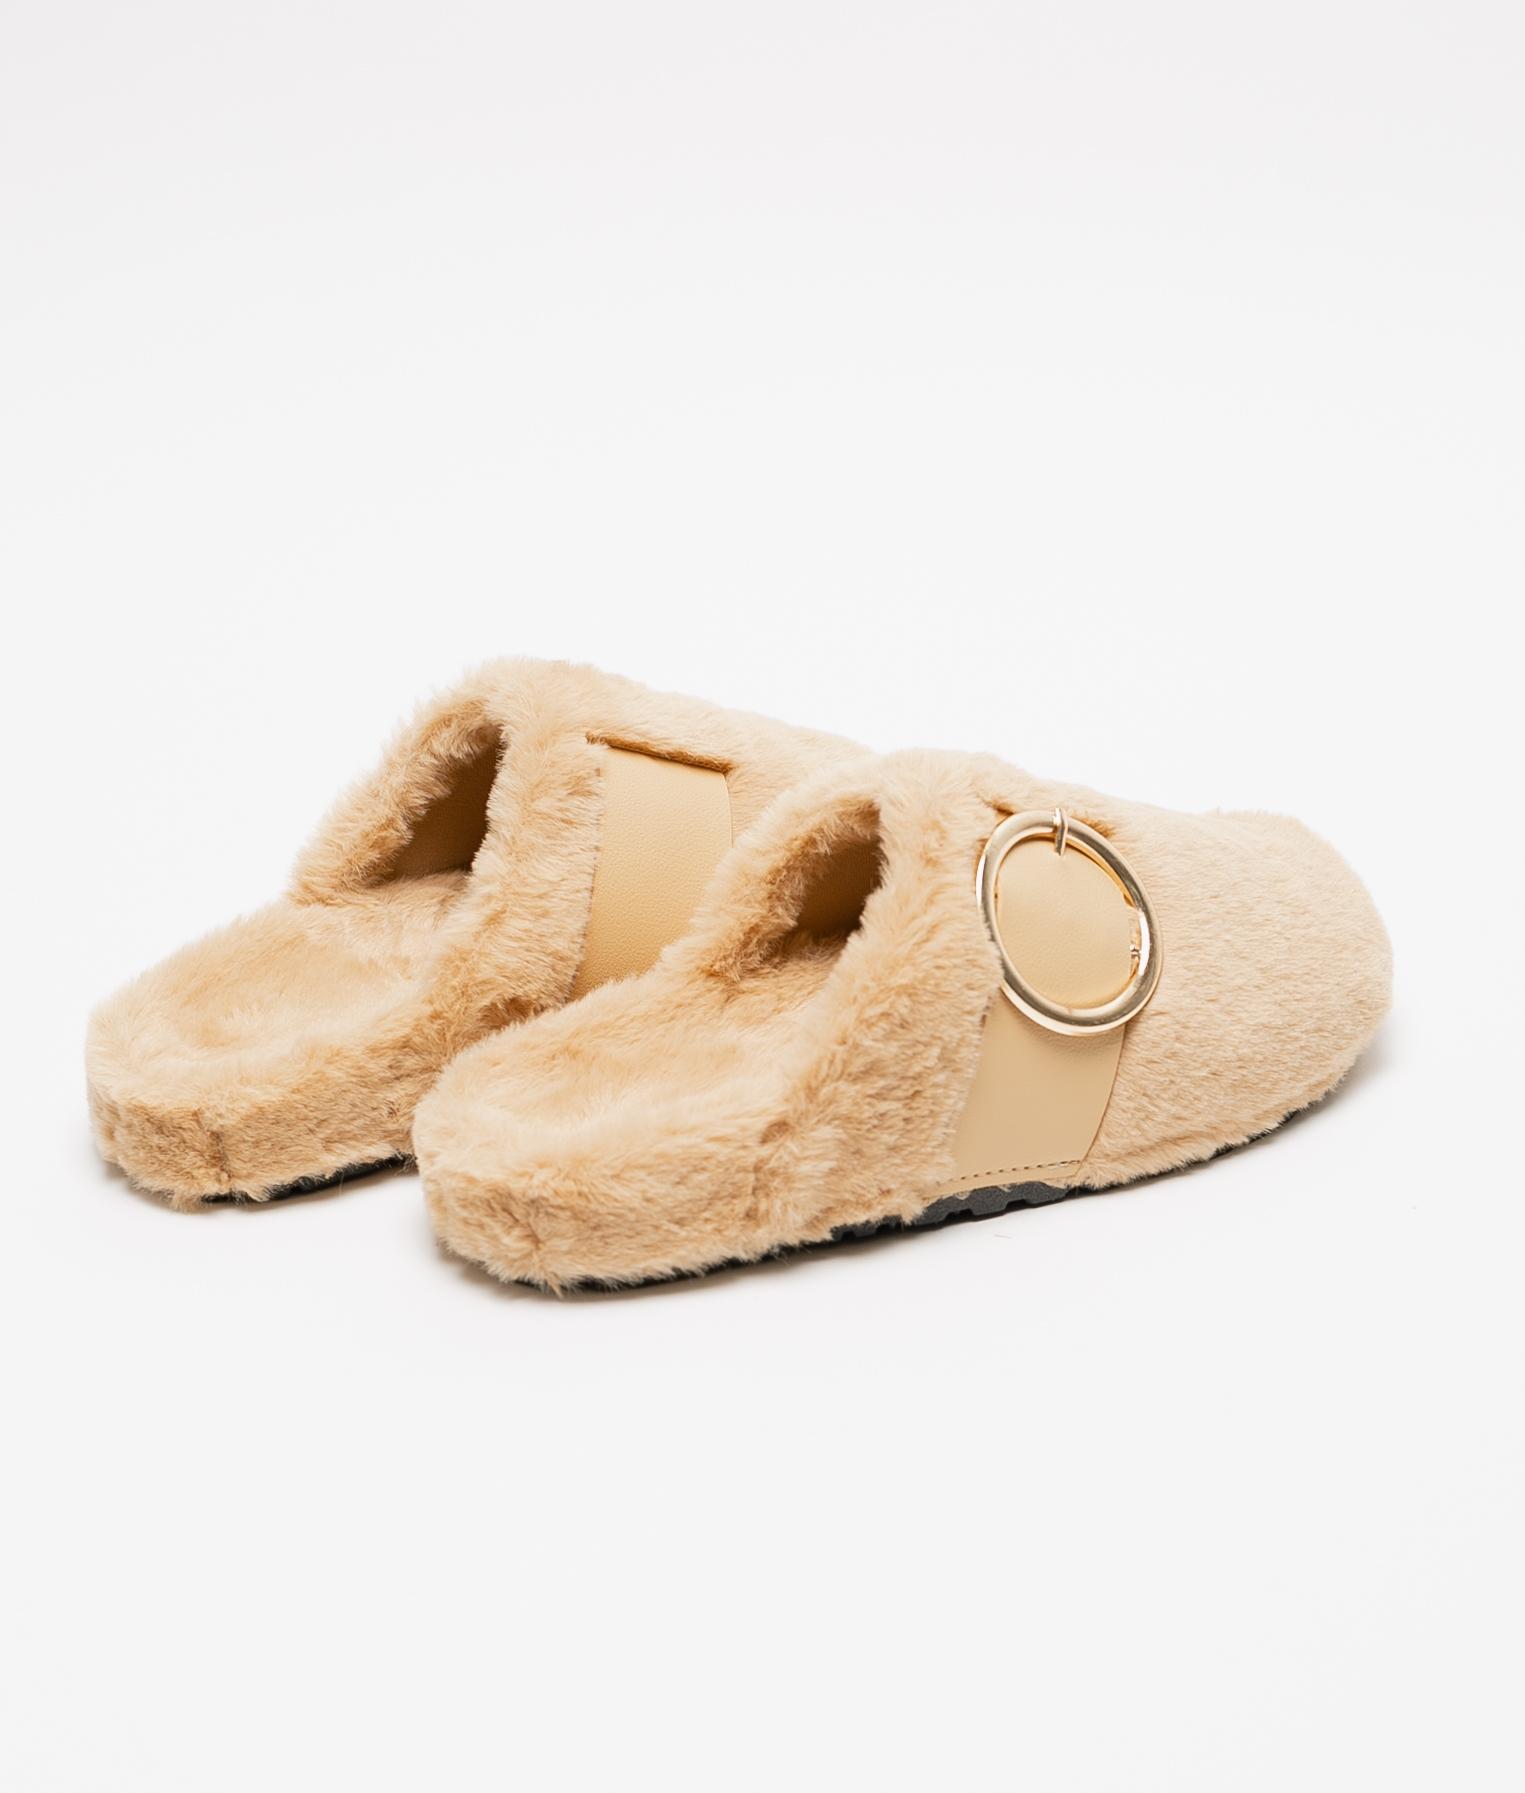 LALI SLIPPERS - CAMEL